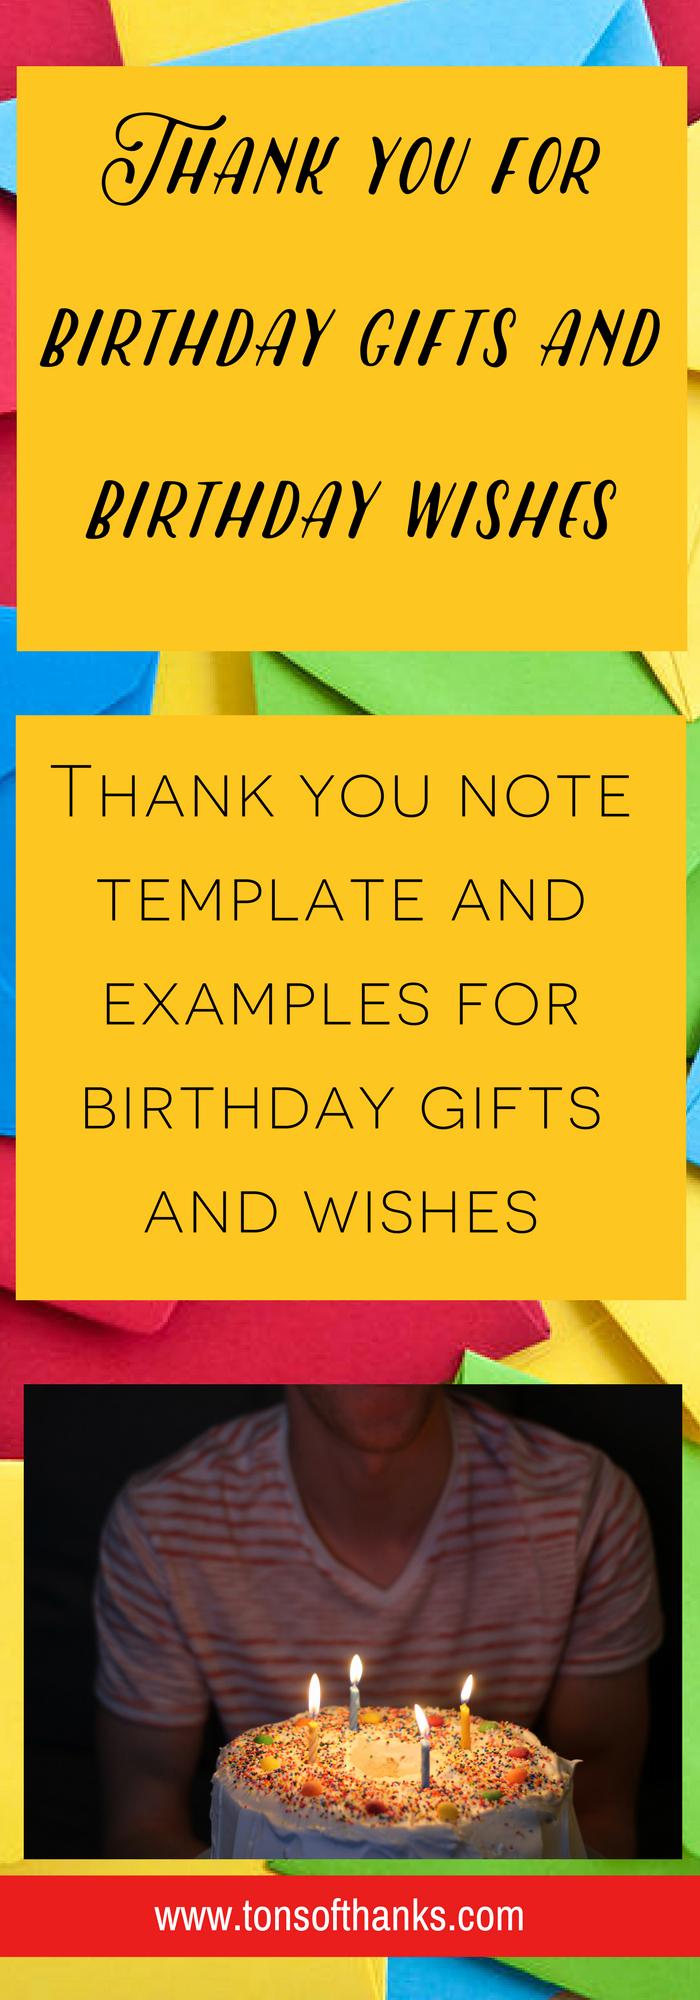 Sample Birthday Thank You Notes Luxury Thank You for the Birthday Wishes Thank You Note Examples